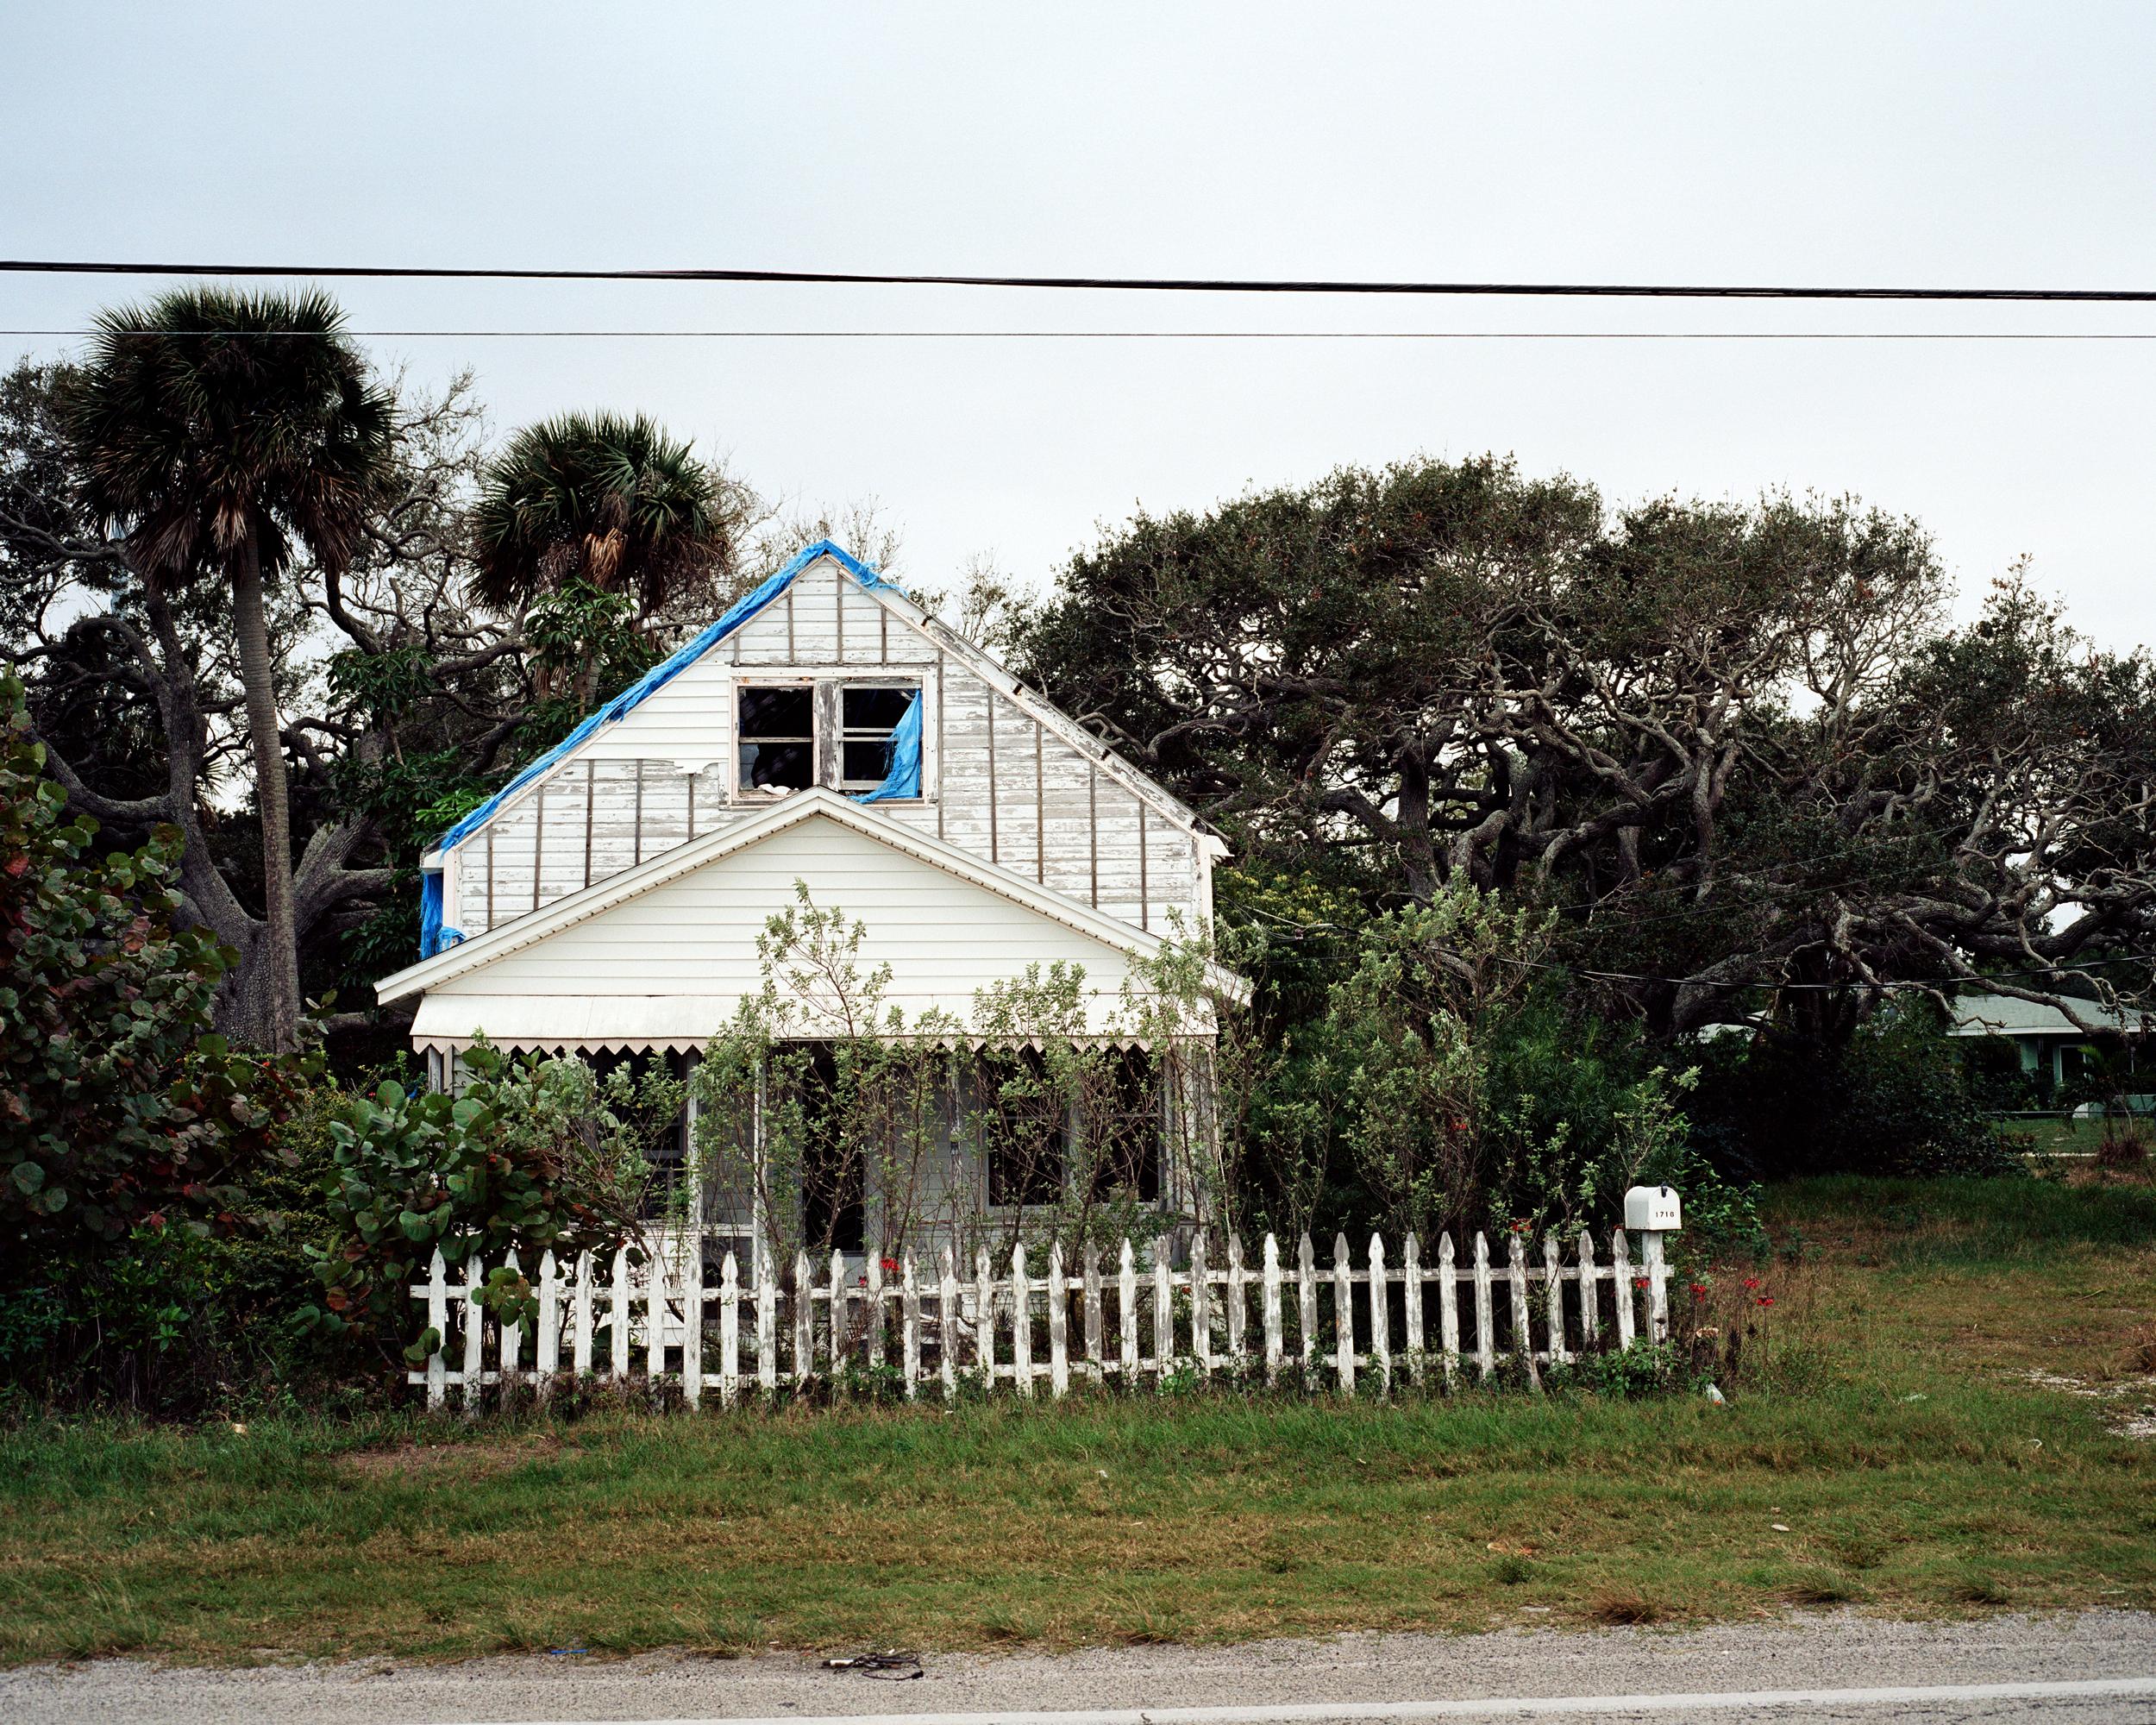 068_Aeschleah_Florida.jpg